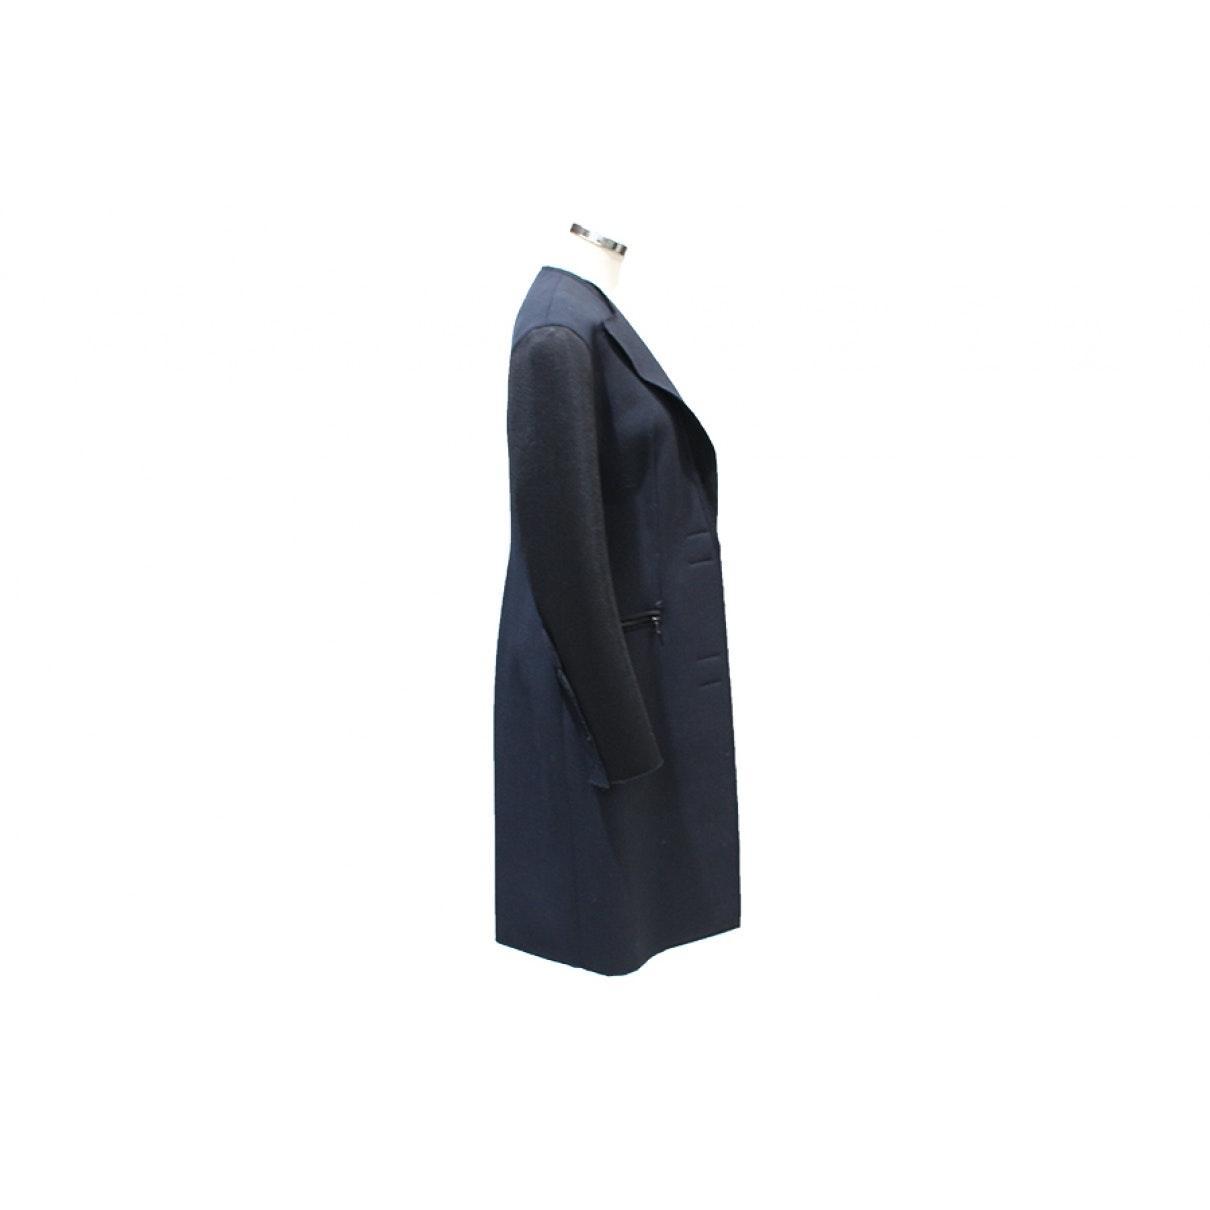 Mantel en Polyester Marine Synthétique Lanvin en coloris Bleu 0Hmpu